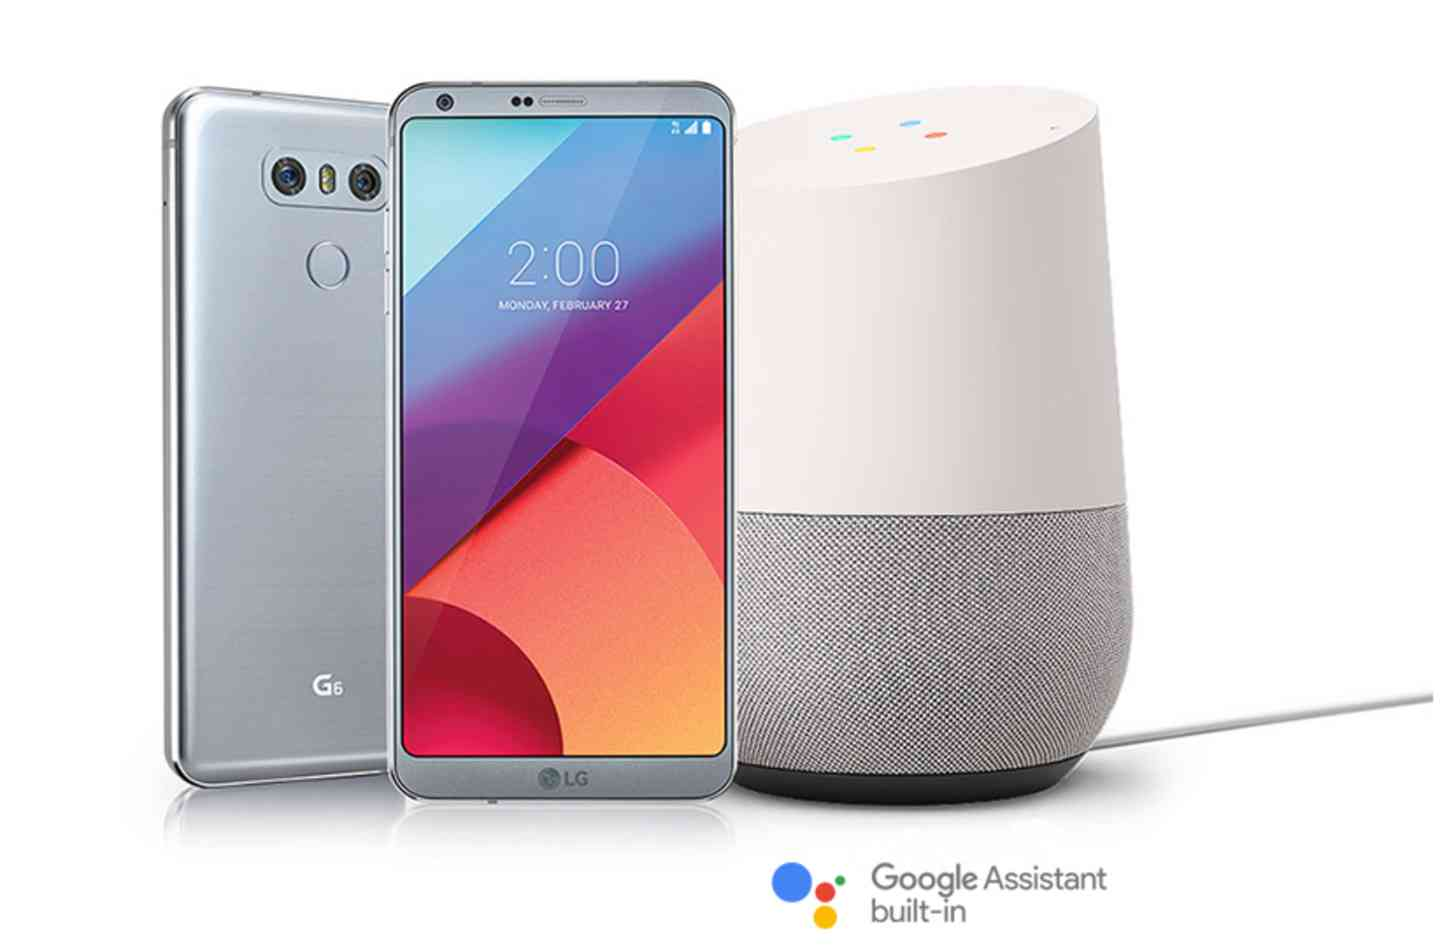 LG G6 free Google Home promotion